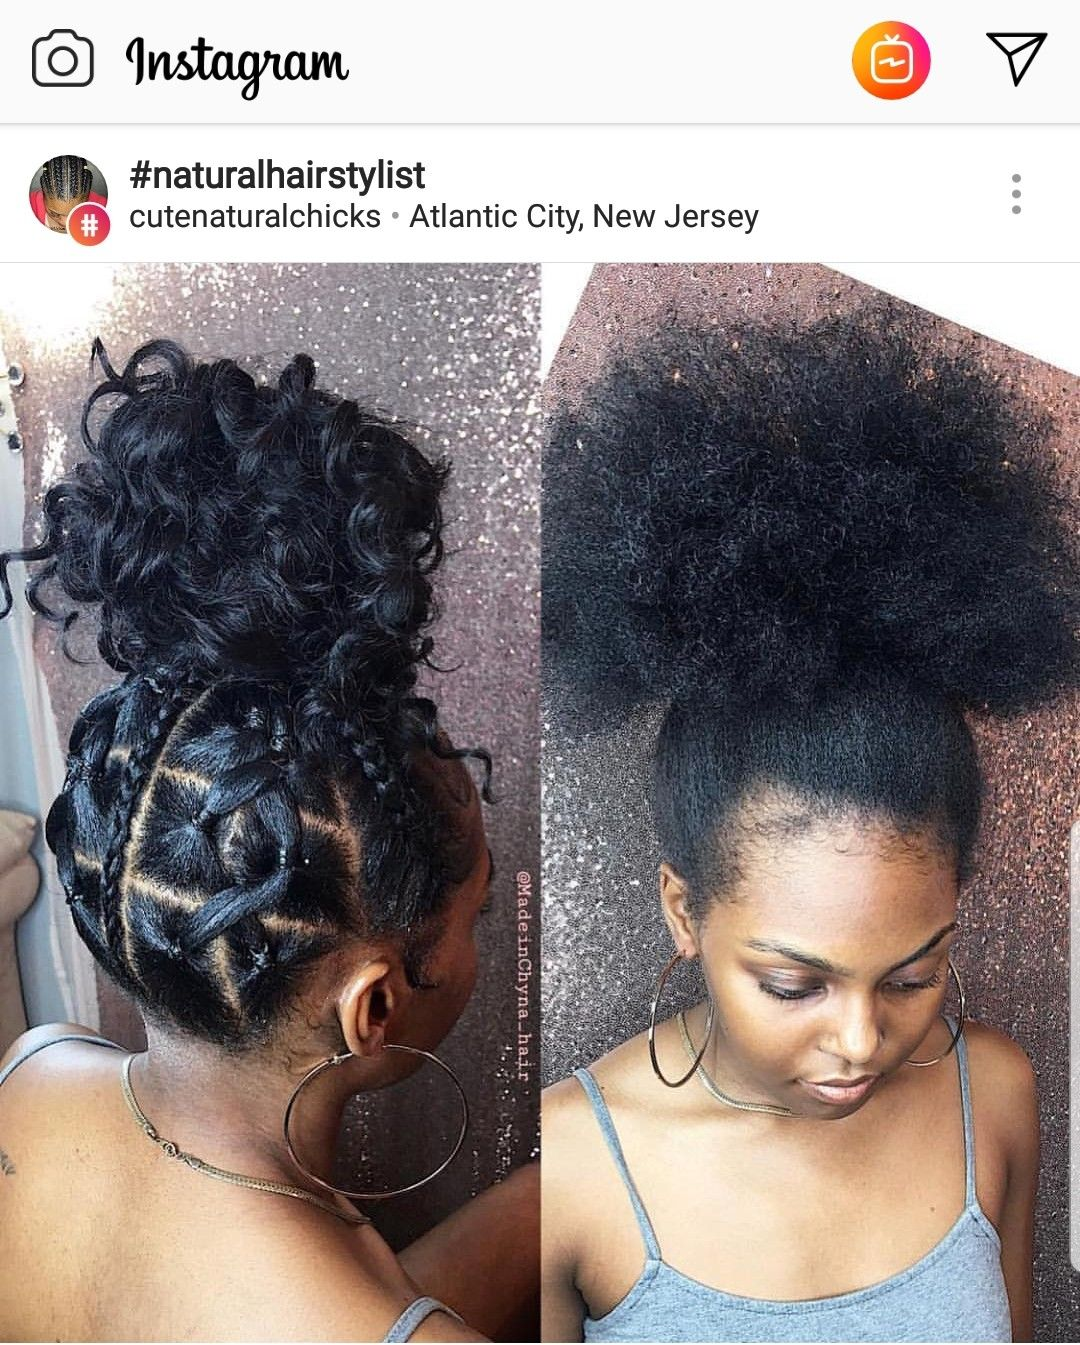 hair inspiration | hair inspiration in 2019 | natural hair